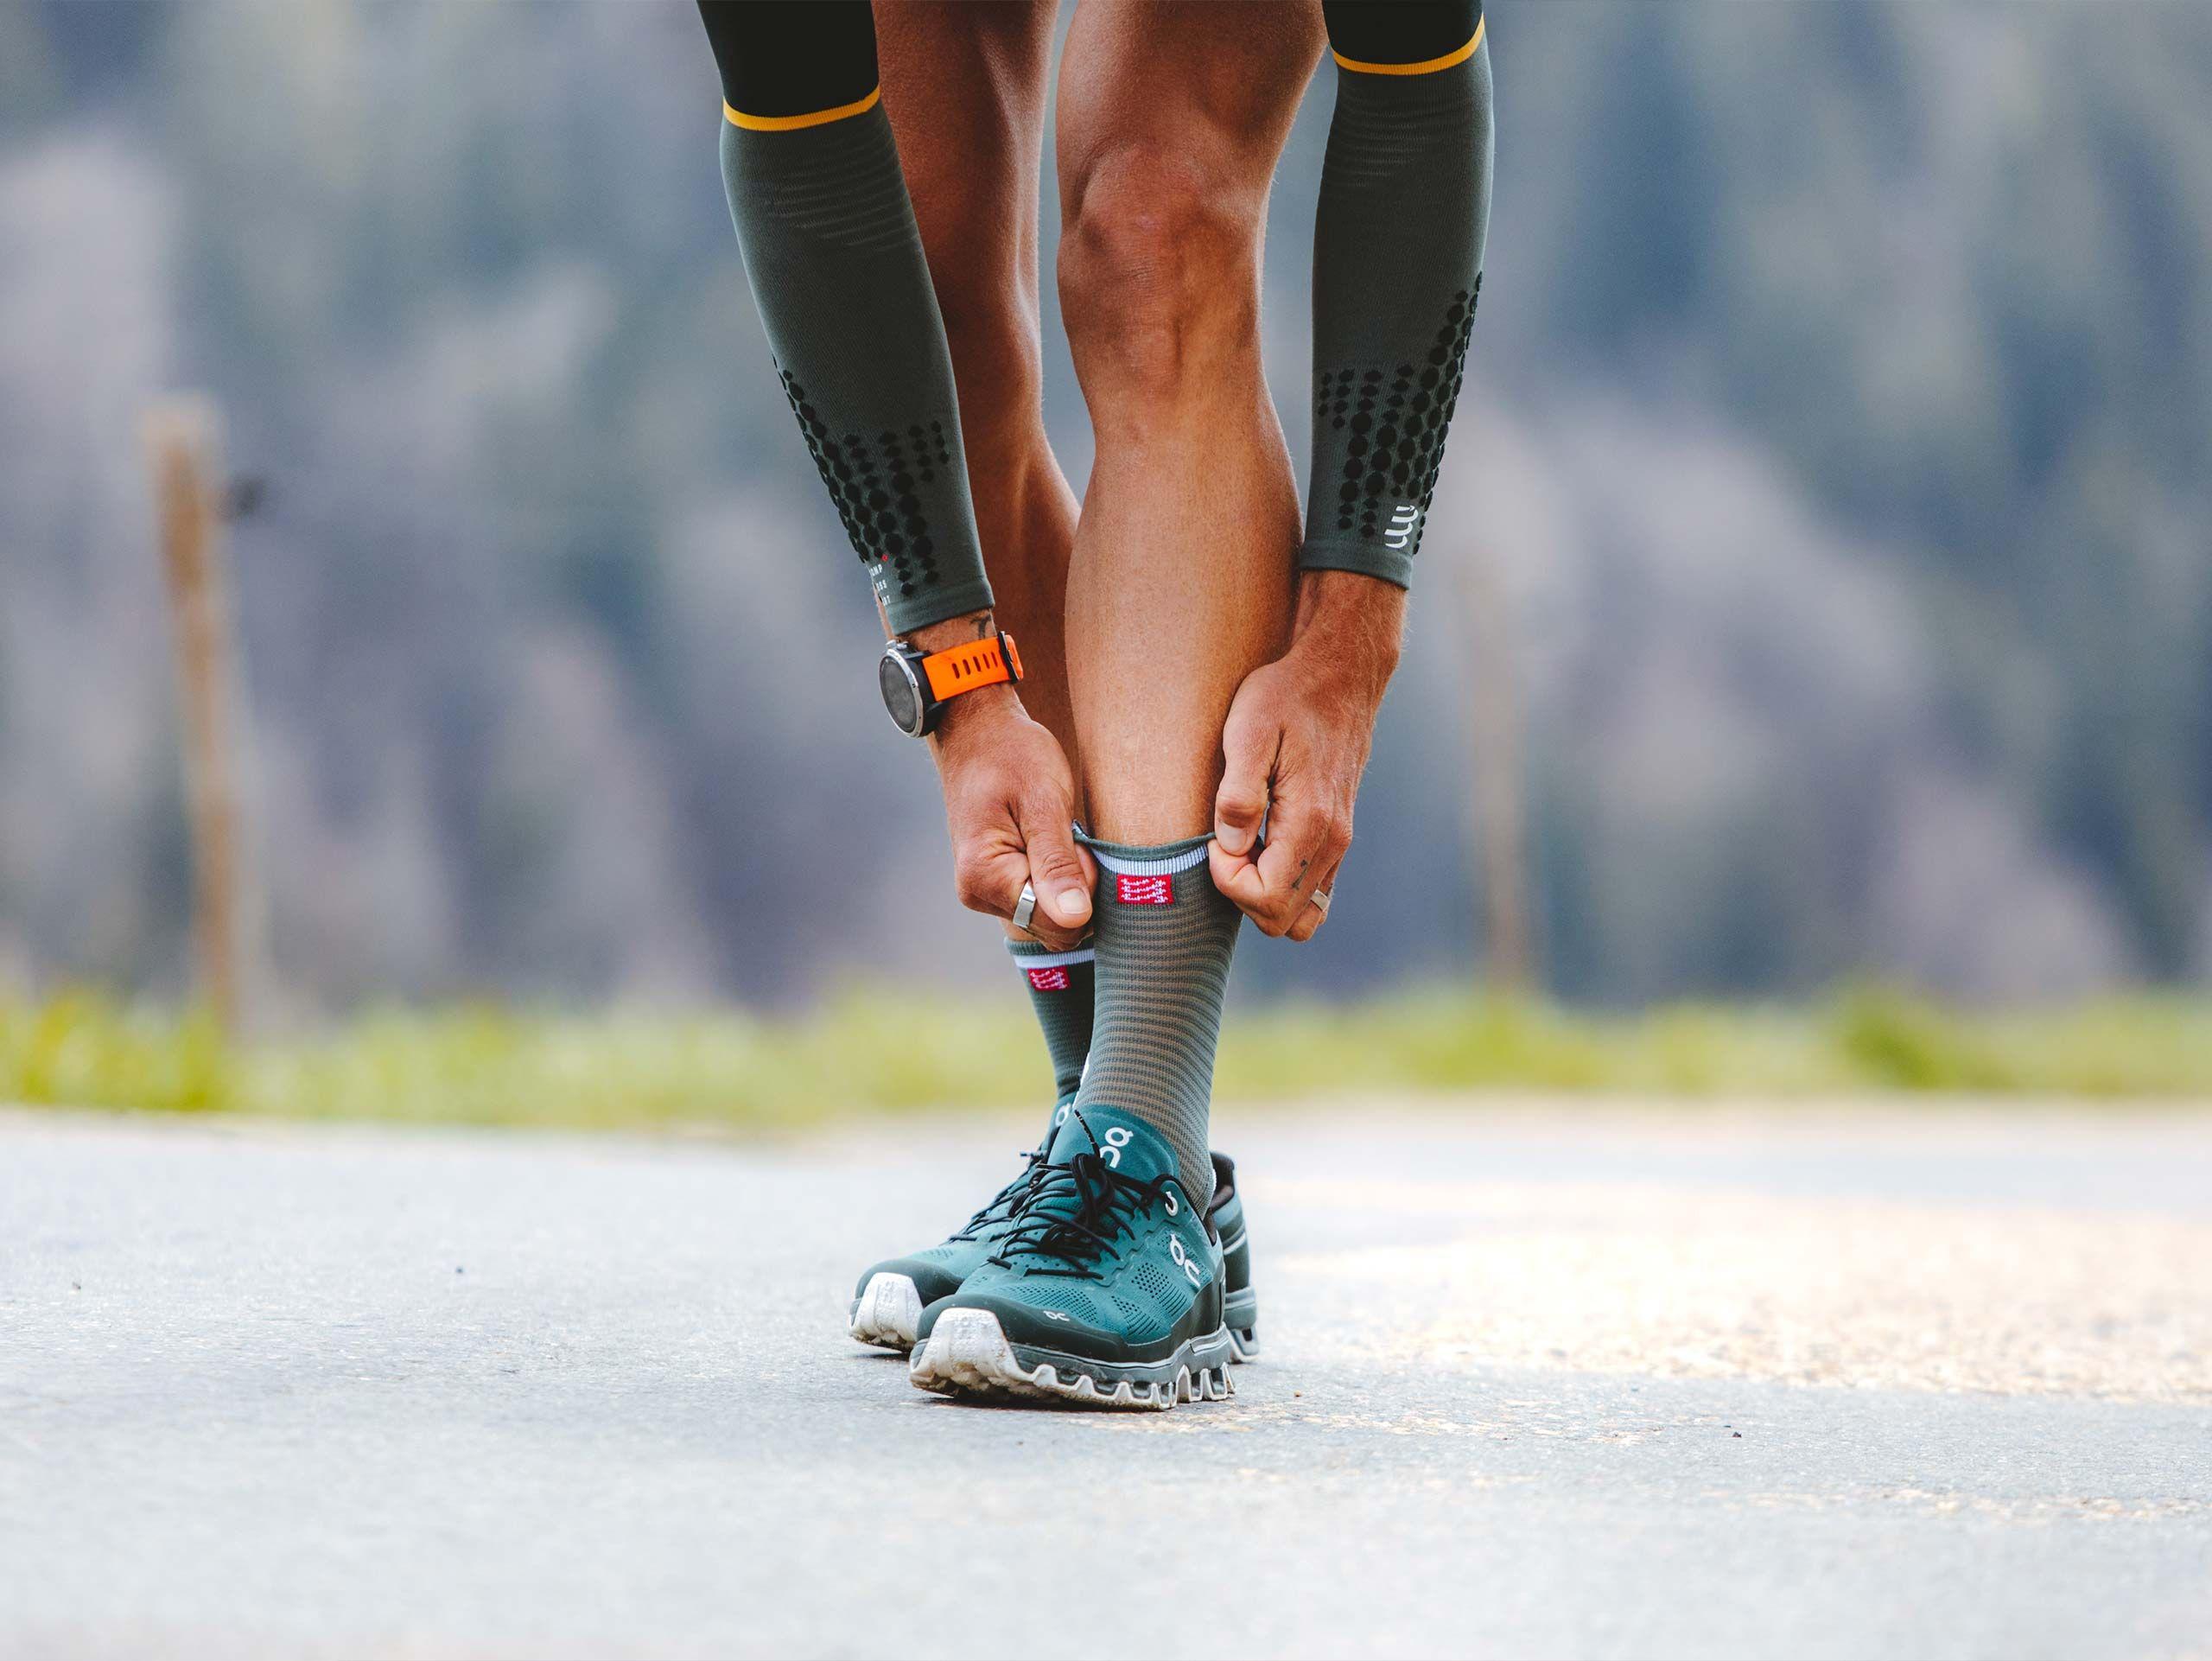 Pro Racing Socks v3.0 Run High SILVER PINE/WHITE